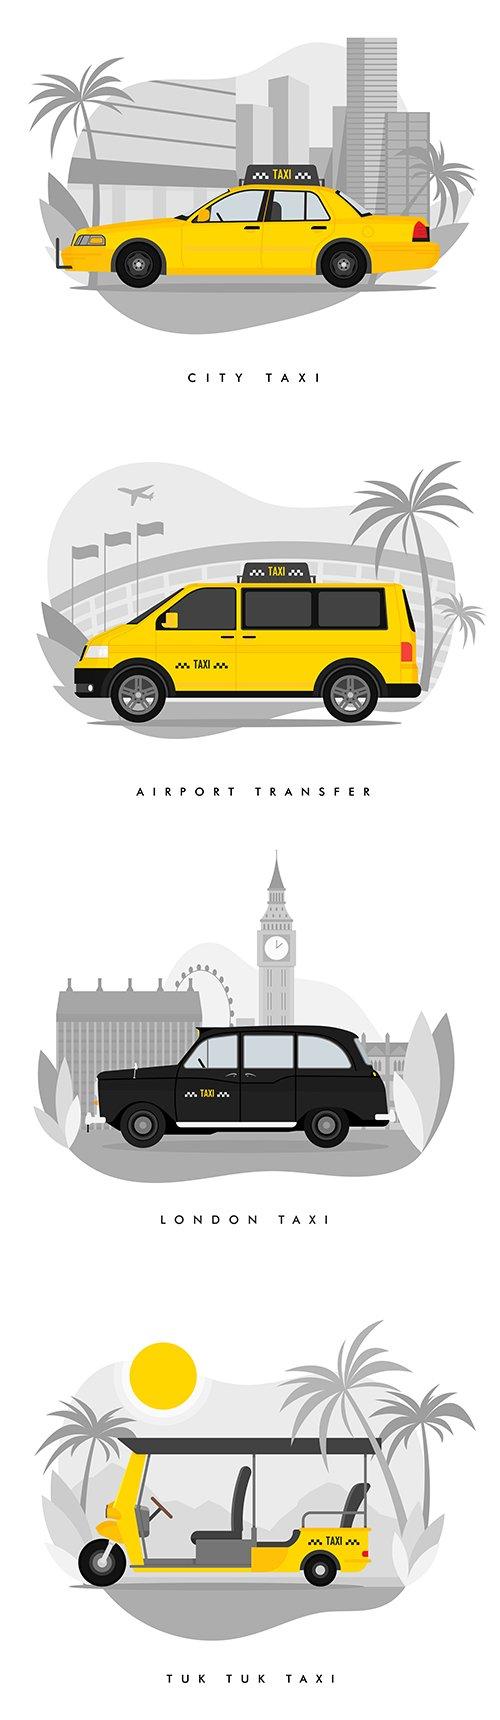 Taxi Services Flat Cartoon Illustrations